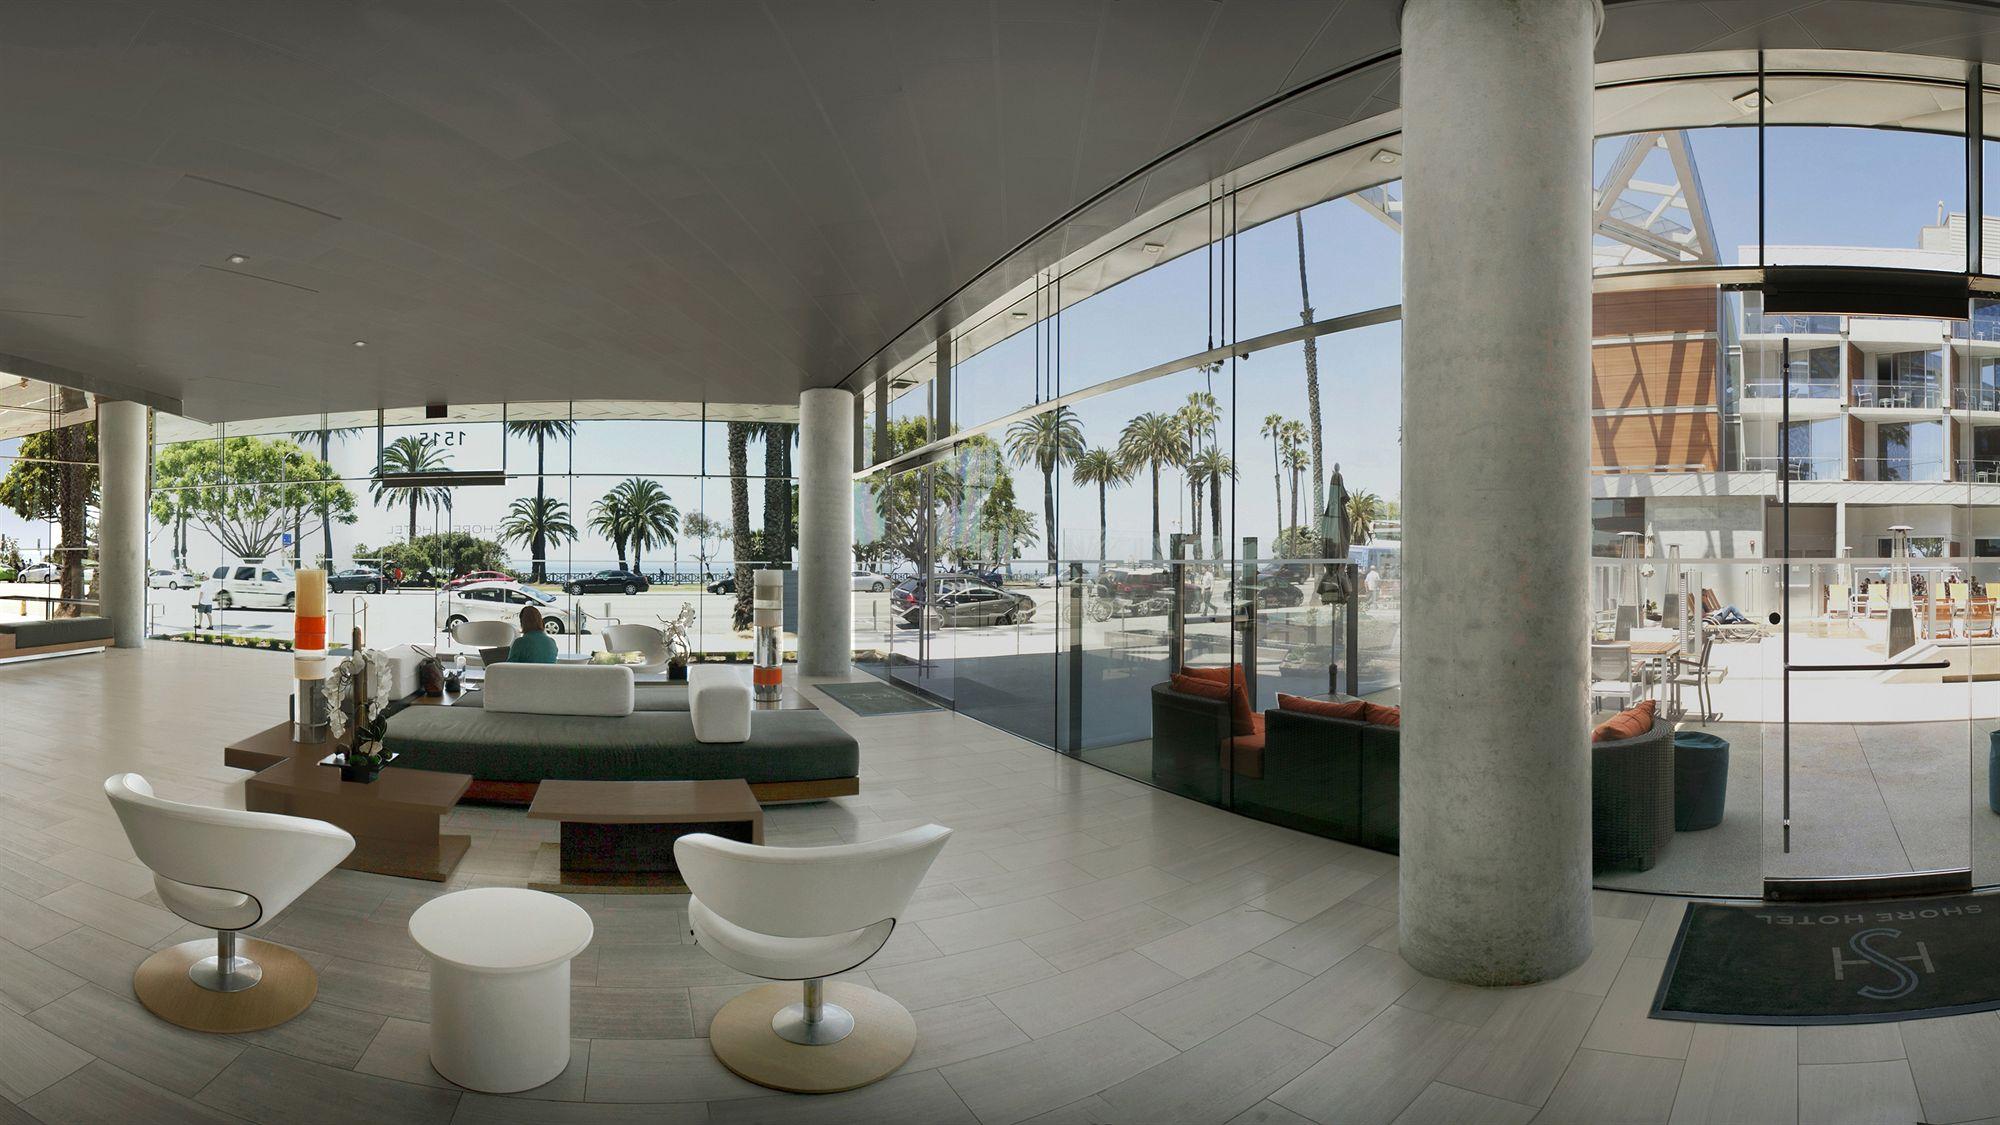 discount coupon for shore hotel in santa monica. Black Bedroom Furniture Sets. Home Design Ideas